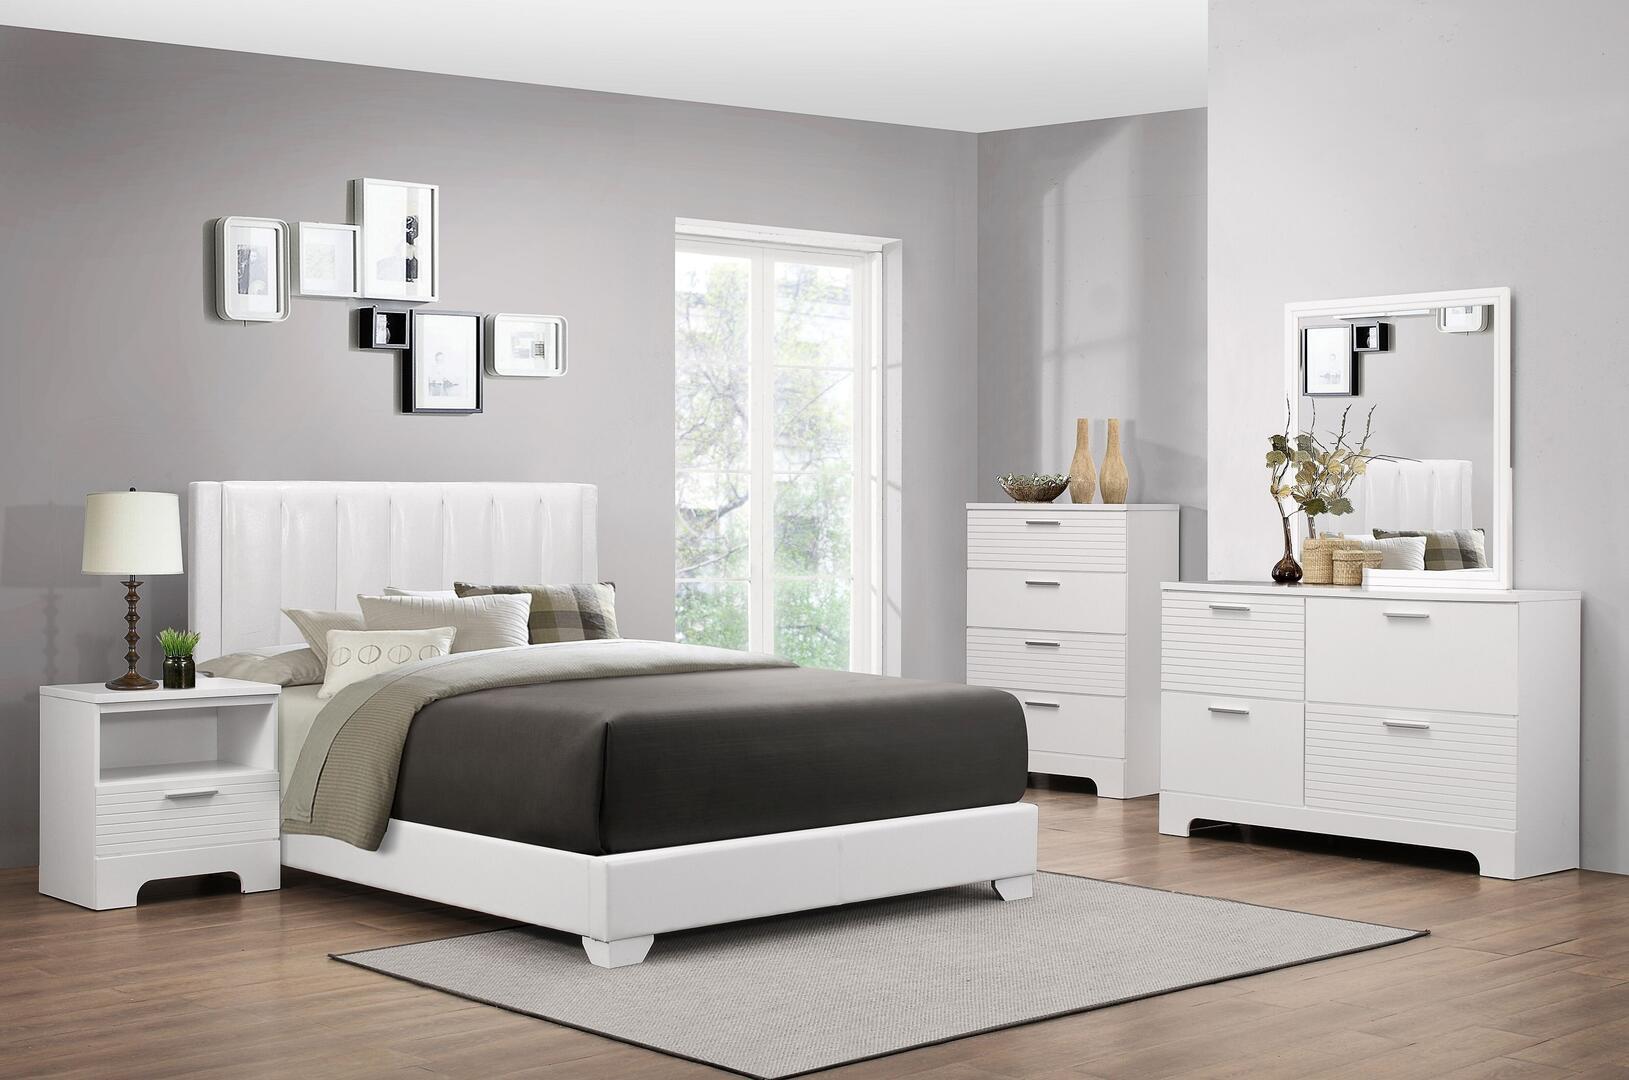 Myco Furniture Moderno 5 Piece Full Size Bedroom Set